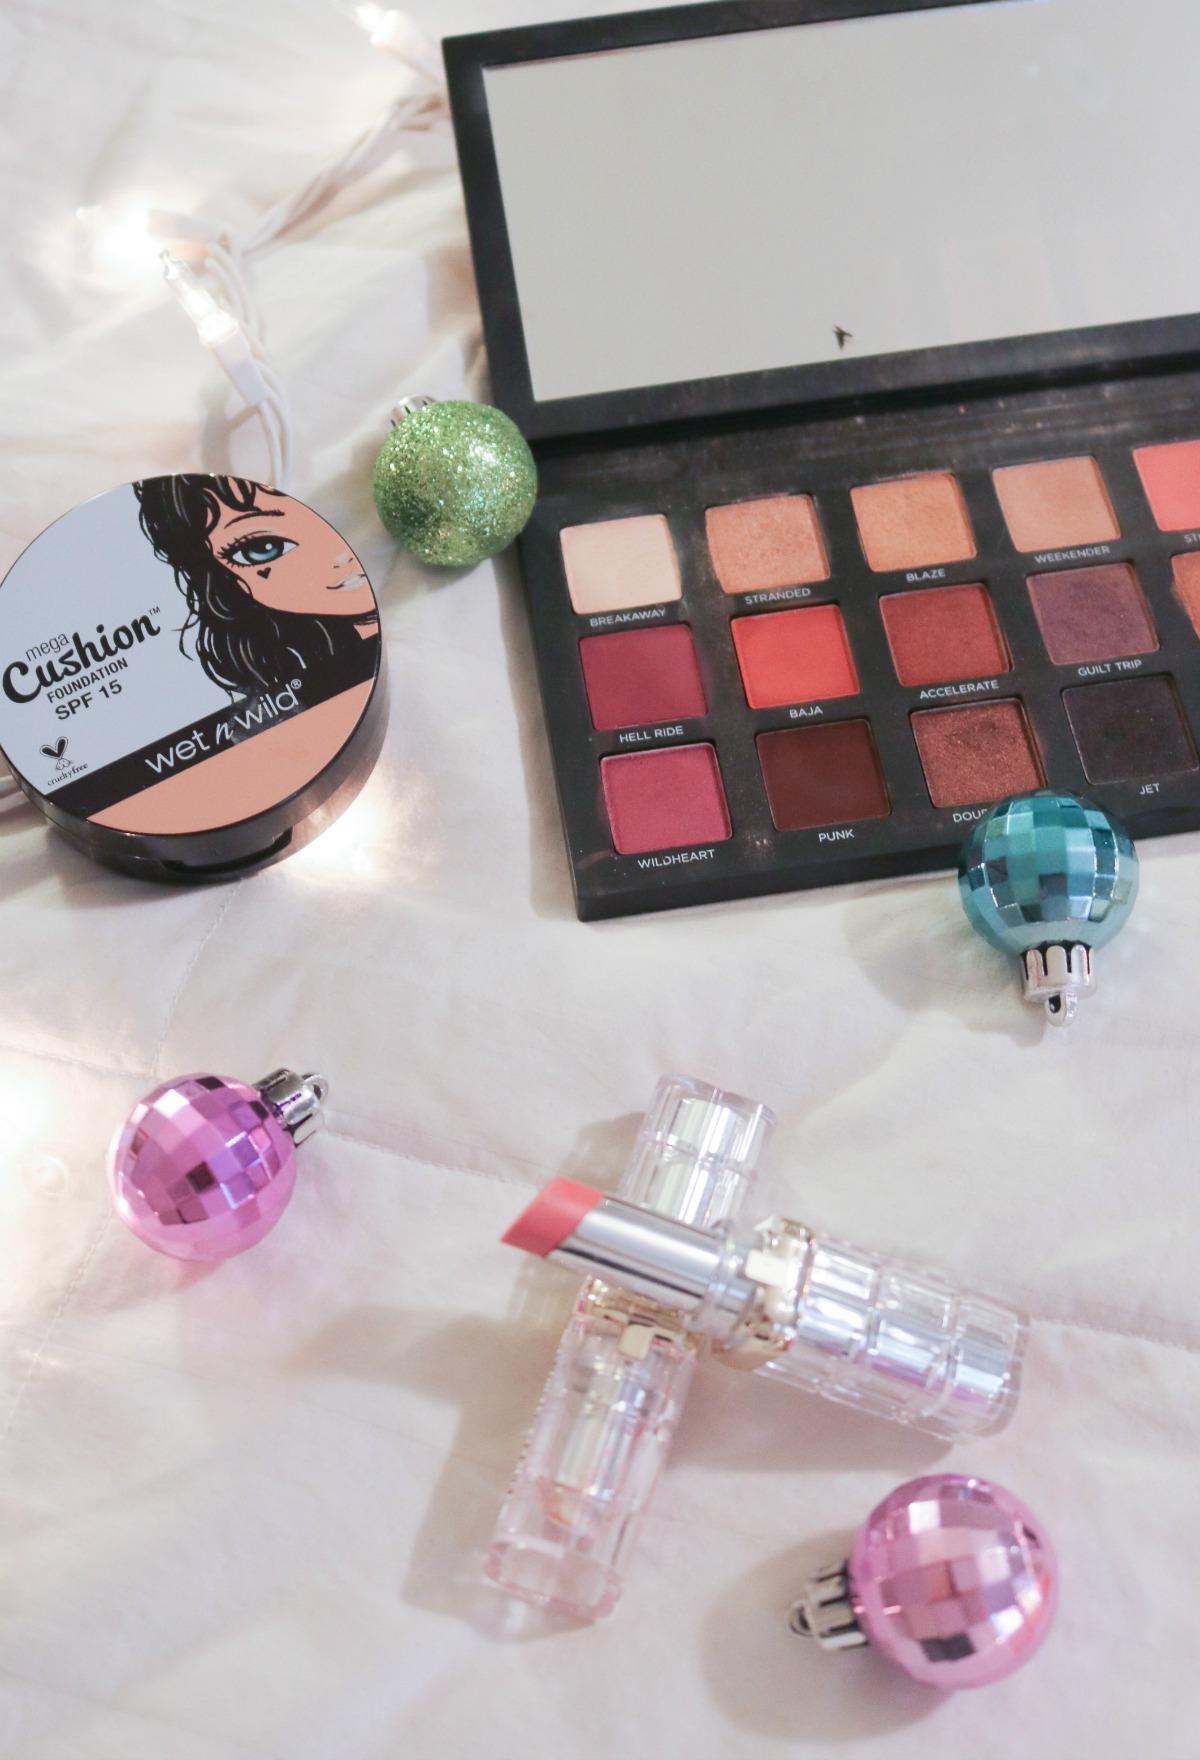 Best 2018 Makeup Releases I Beauty Blog DreaminLace.com #Bestof2018 #MakeupAddict1